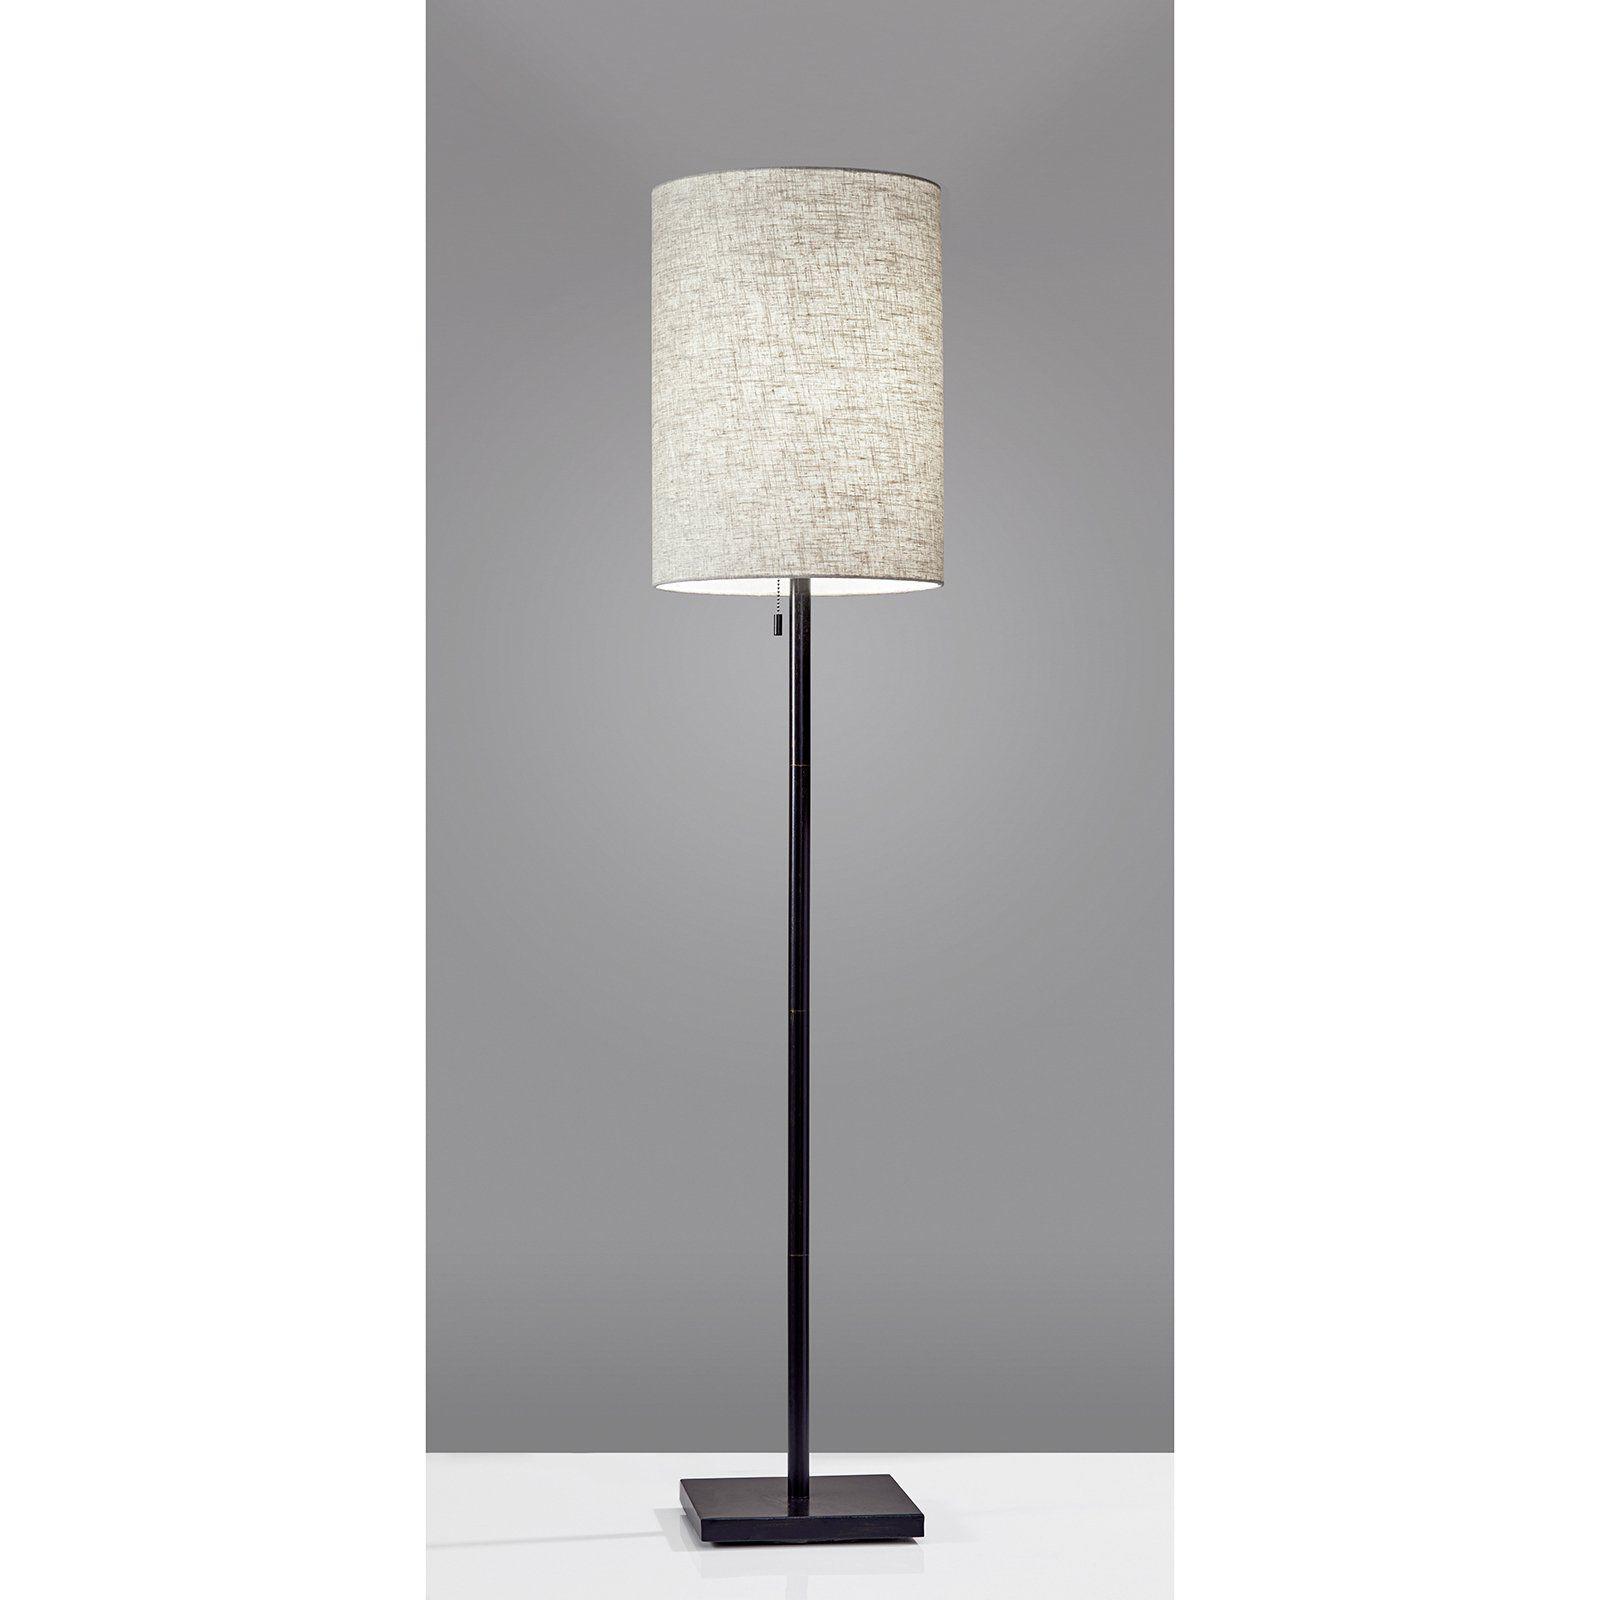 "Adesso 1547 Liam 1 Light 601/2"" Tall Floor Lamp Walmart"